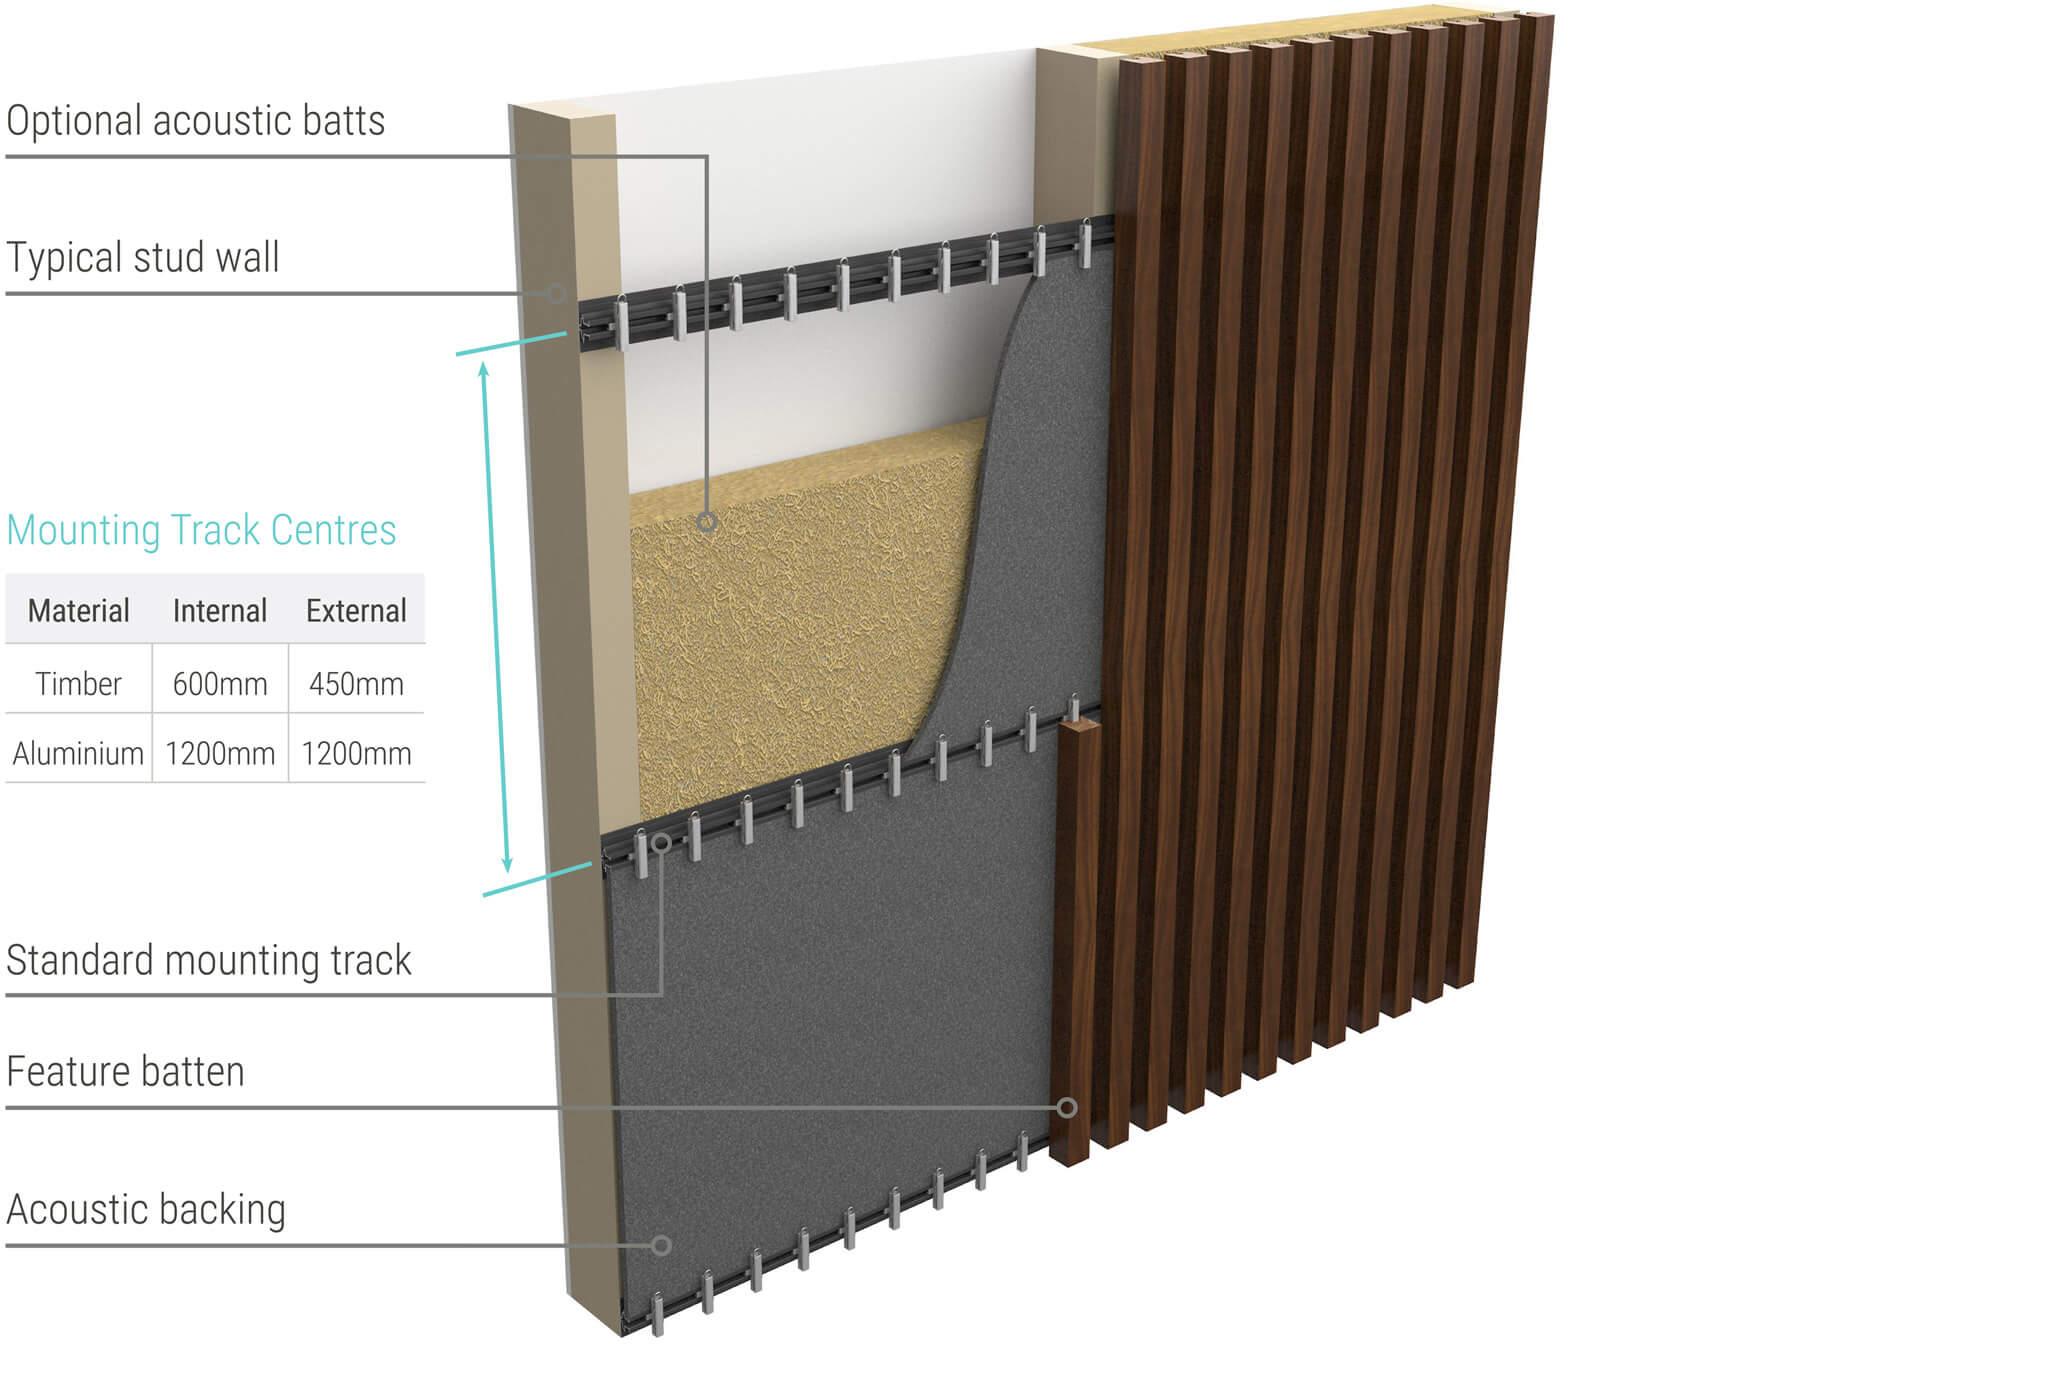 Sculptform - typical wall setup